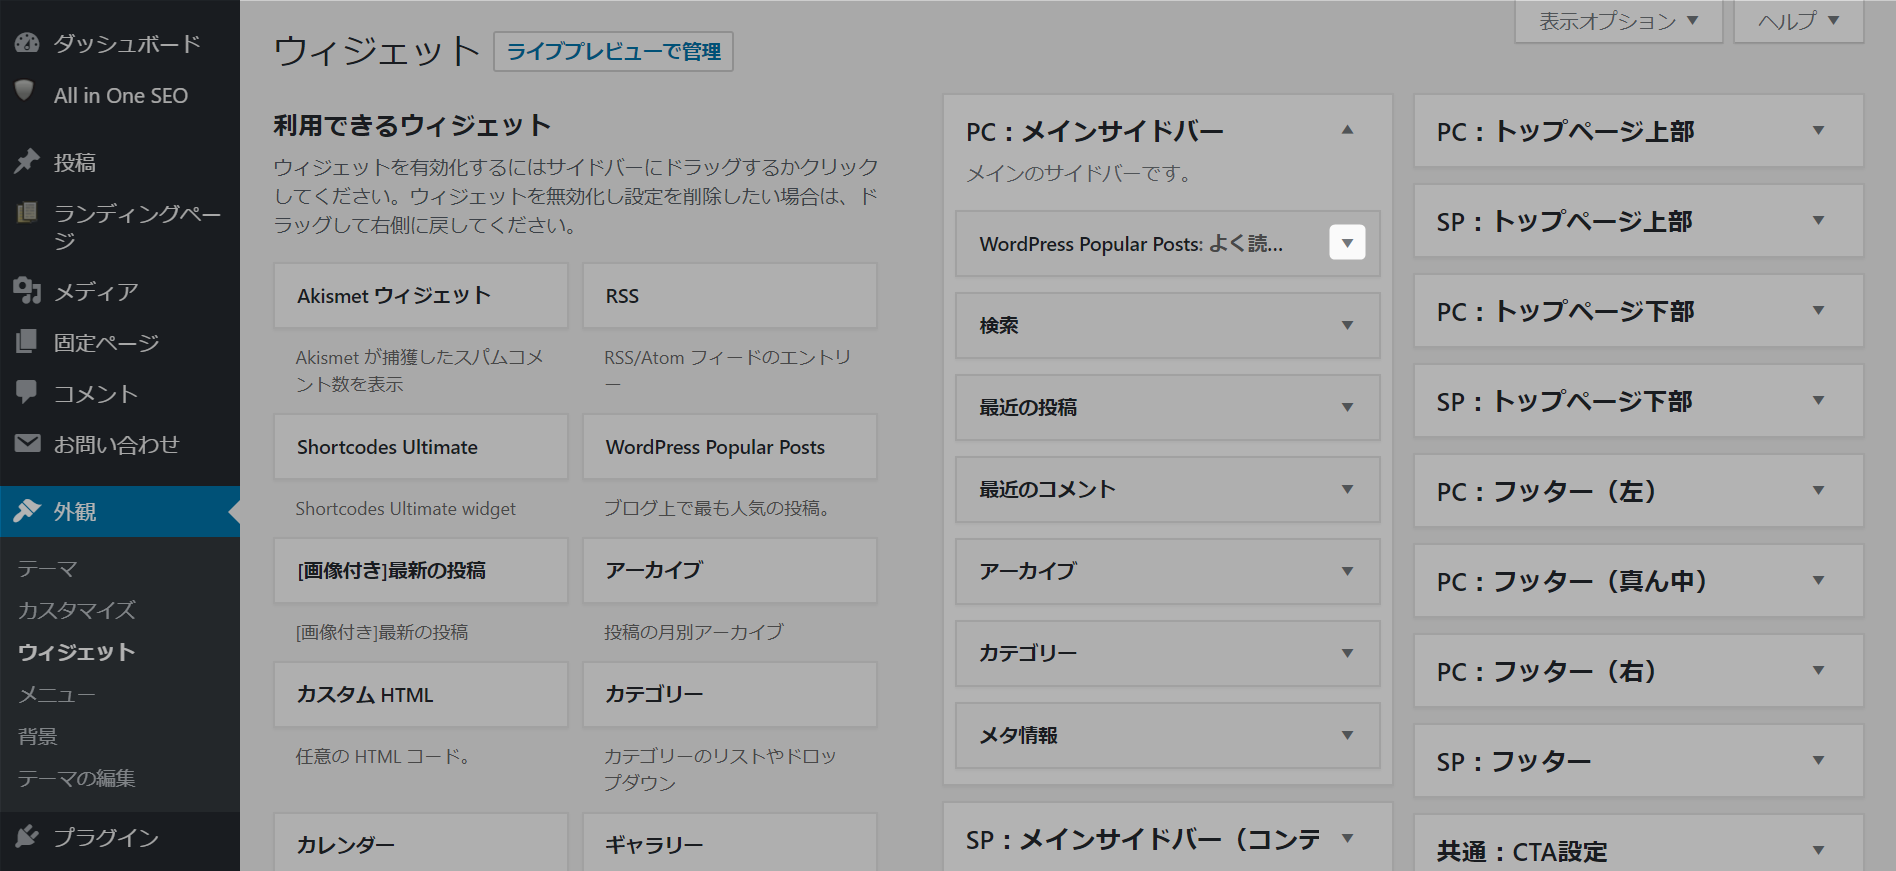 WordpressPopularPosts (2)